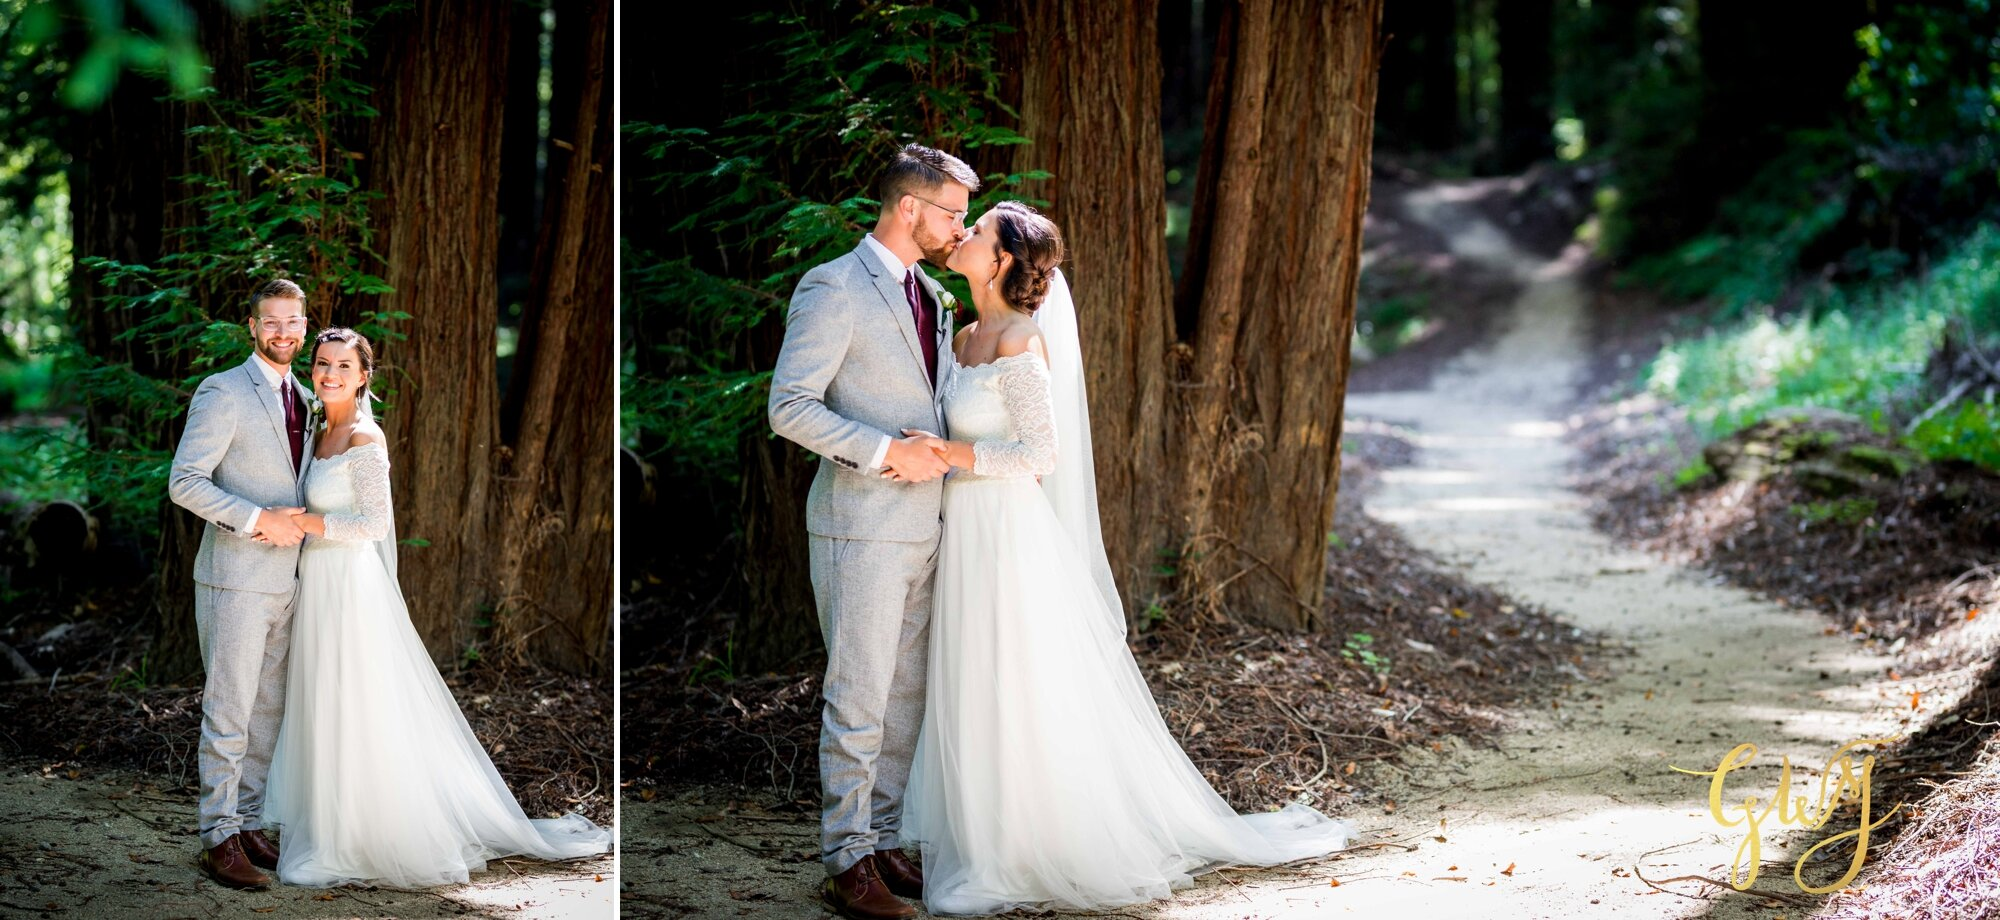 Casey + Jordan's Intimate Big Sur Elopement in the Redwoods by Glass Woods Media 20.jpg